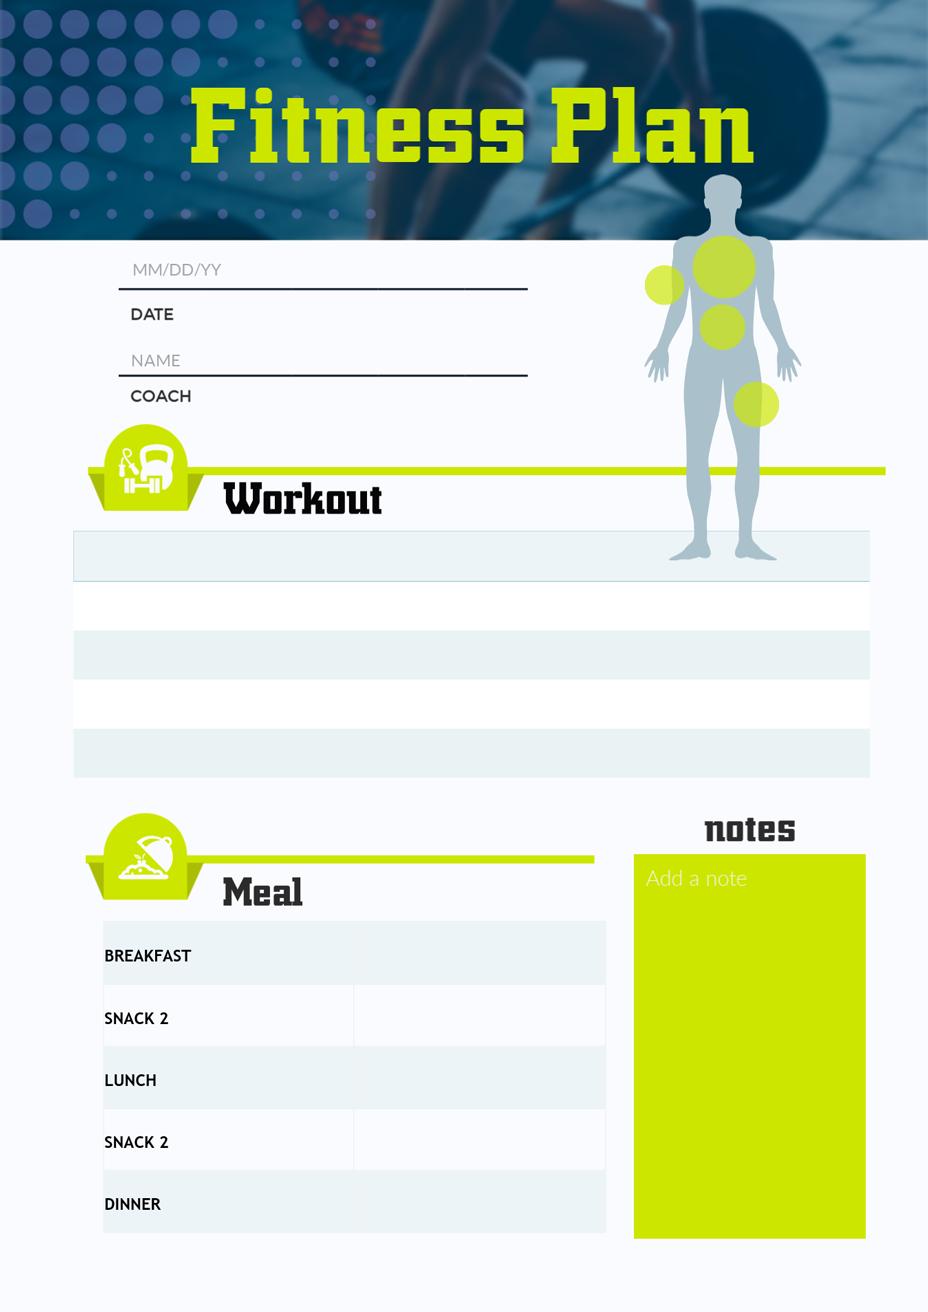 fitness plan schedule template